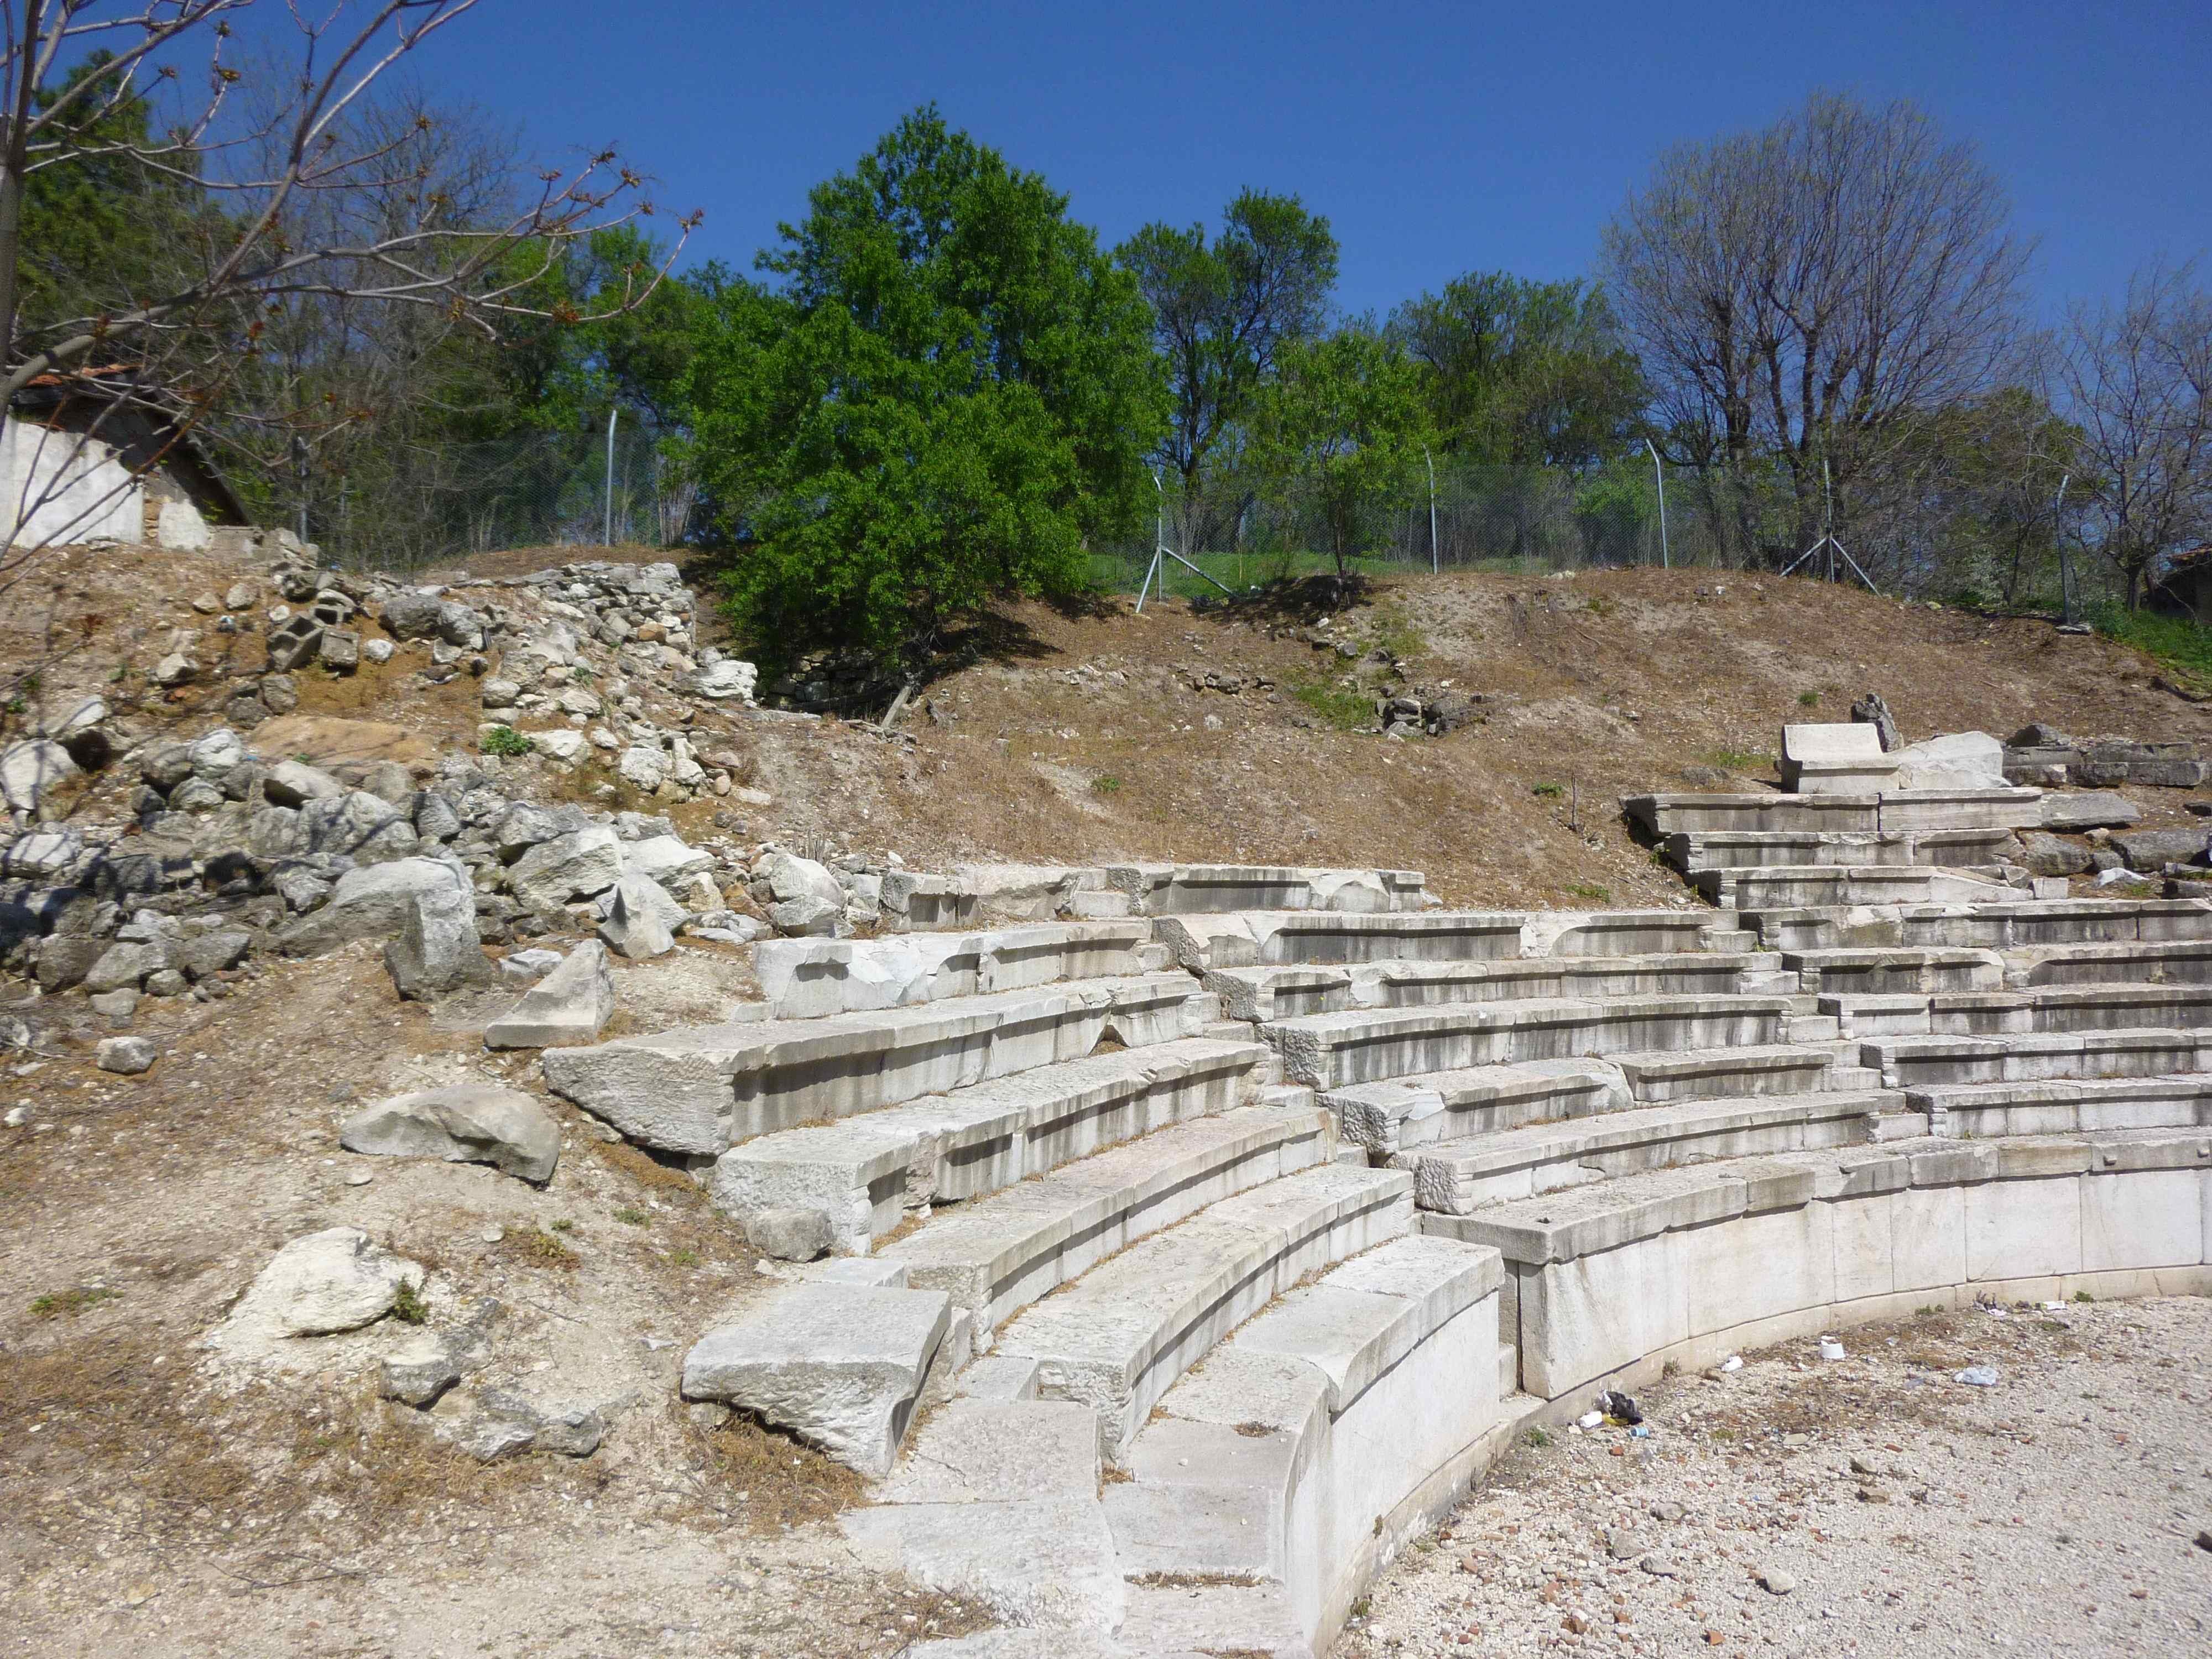 The small Roman amfiteater